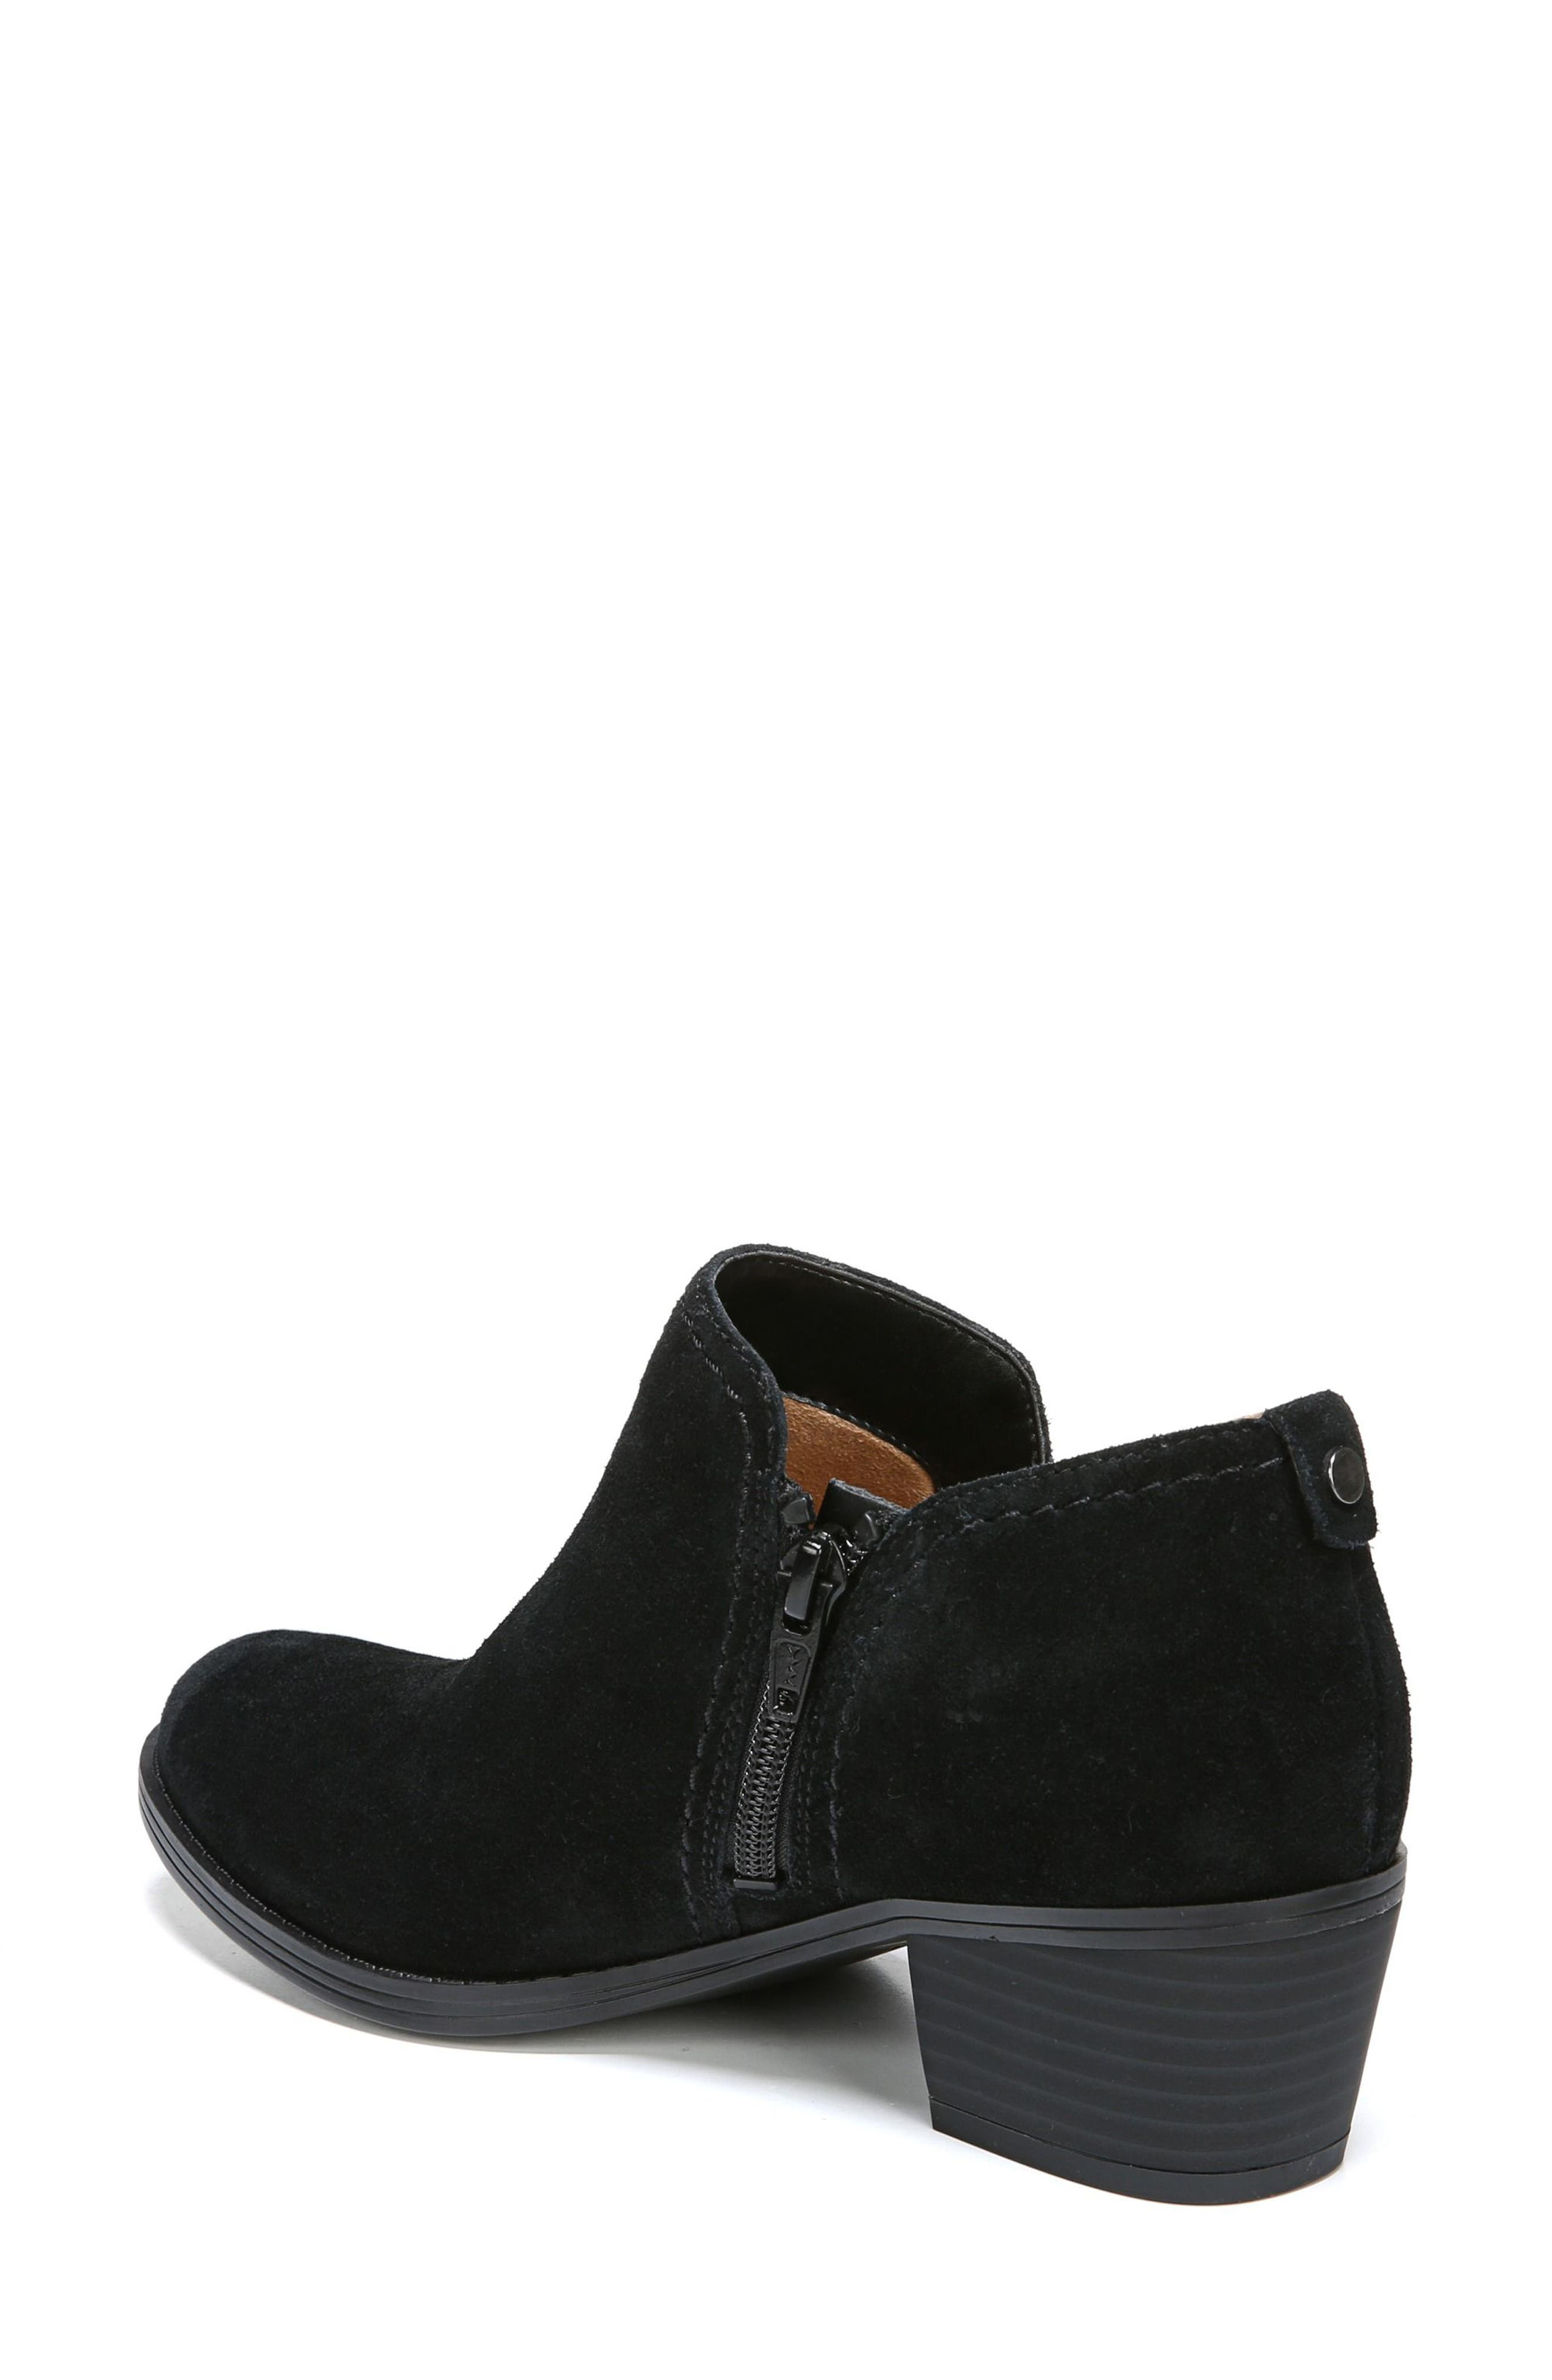 'Zarie' Block Heel Bootie,                             Alternate thumbnail 2, color,                             BLACK SUEDE